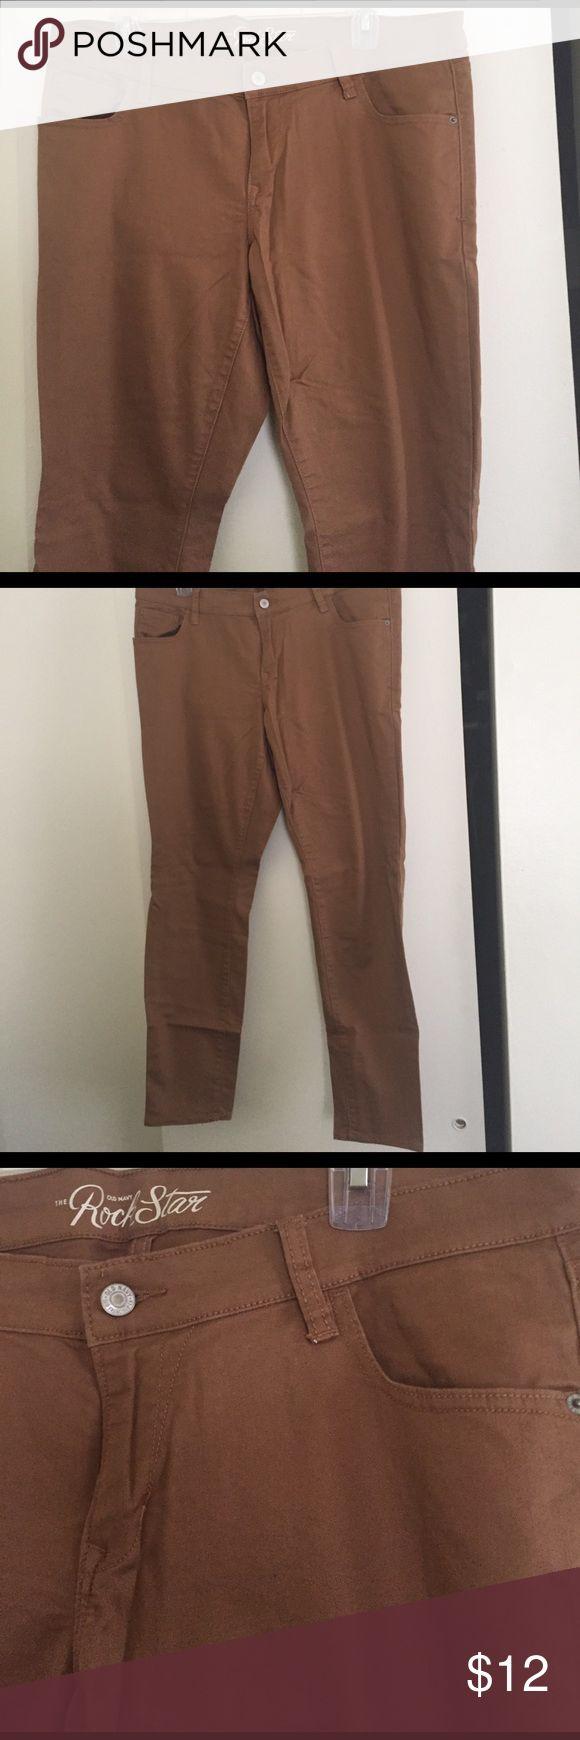 Old Navy Rockstar light brown skinny jeans 👖 Size 16 light brown/tan Old Navy Rockstar skinny jeans. Regular length worn once. Old Navy Pants Skinny